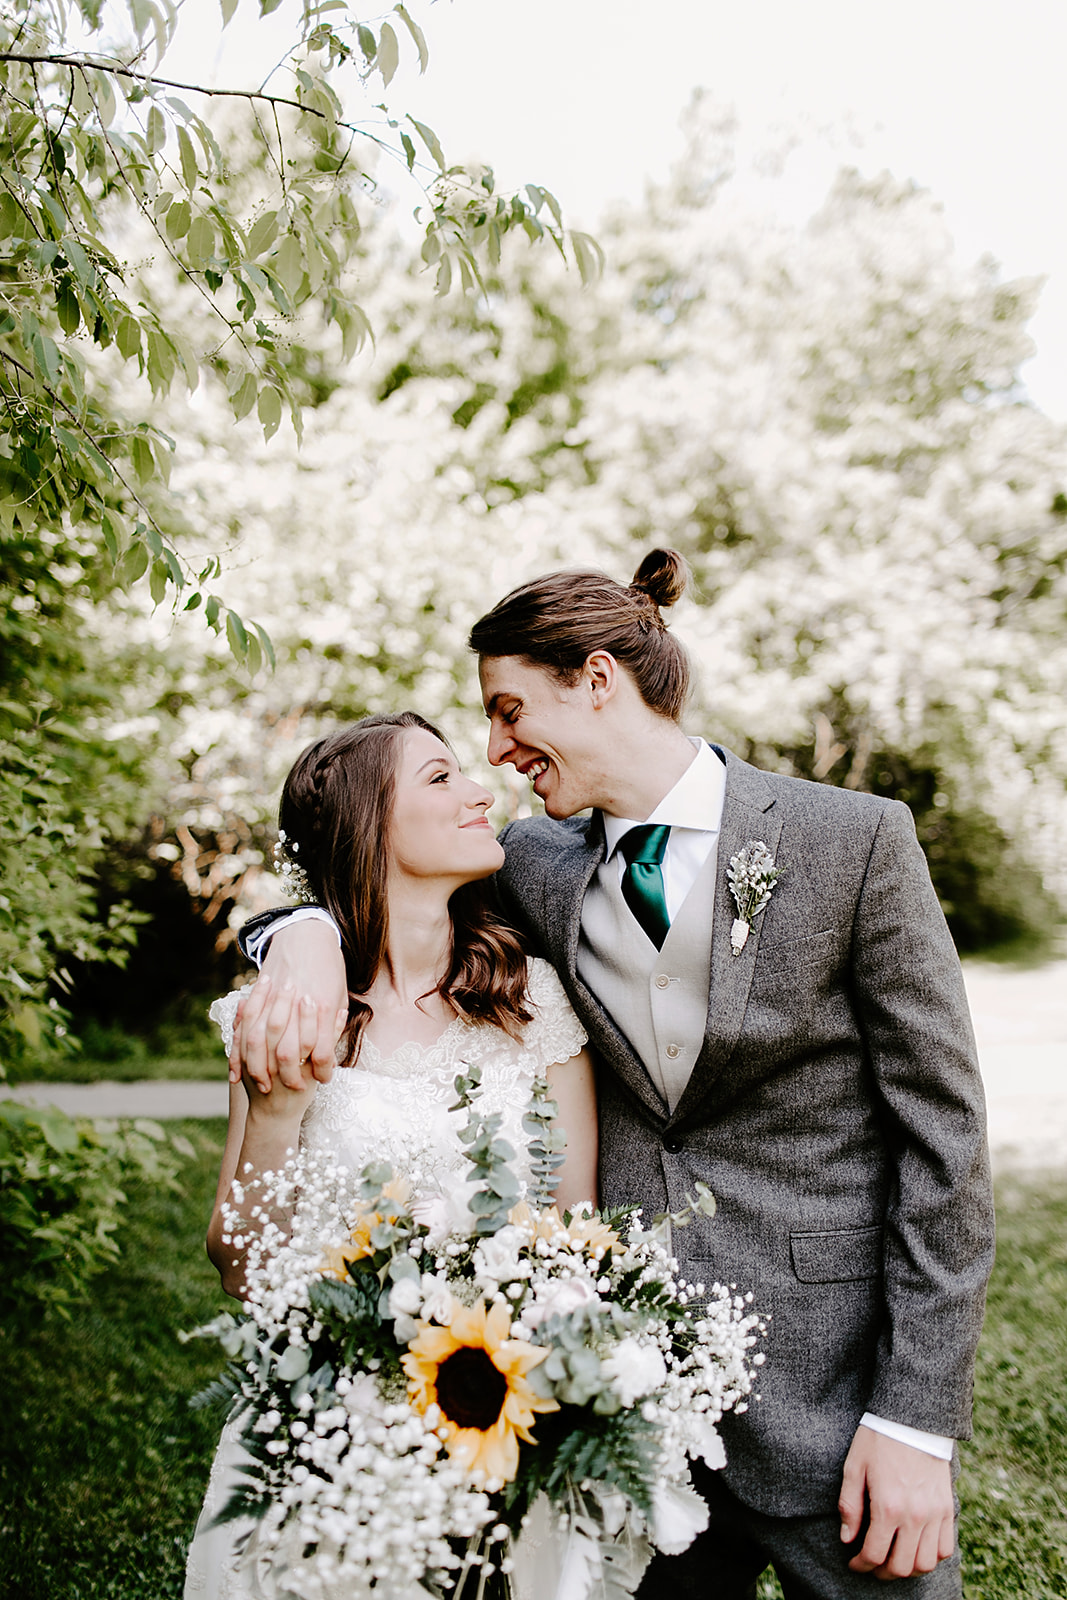 Lily and Easton Wedding Carmel Indiana Cool Creek Park Grace Church Emily Elyse Wehner Photography -171.jpg